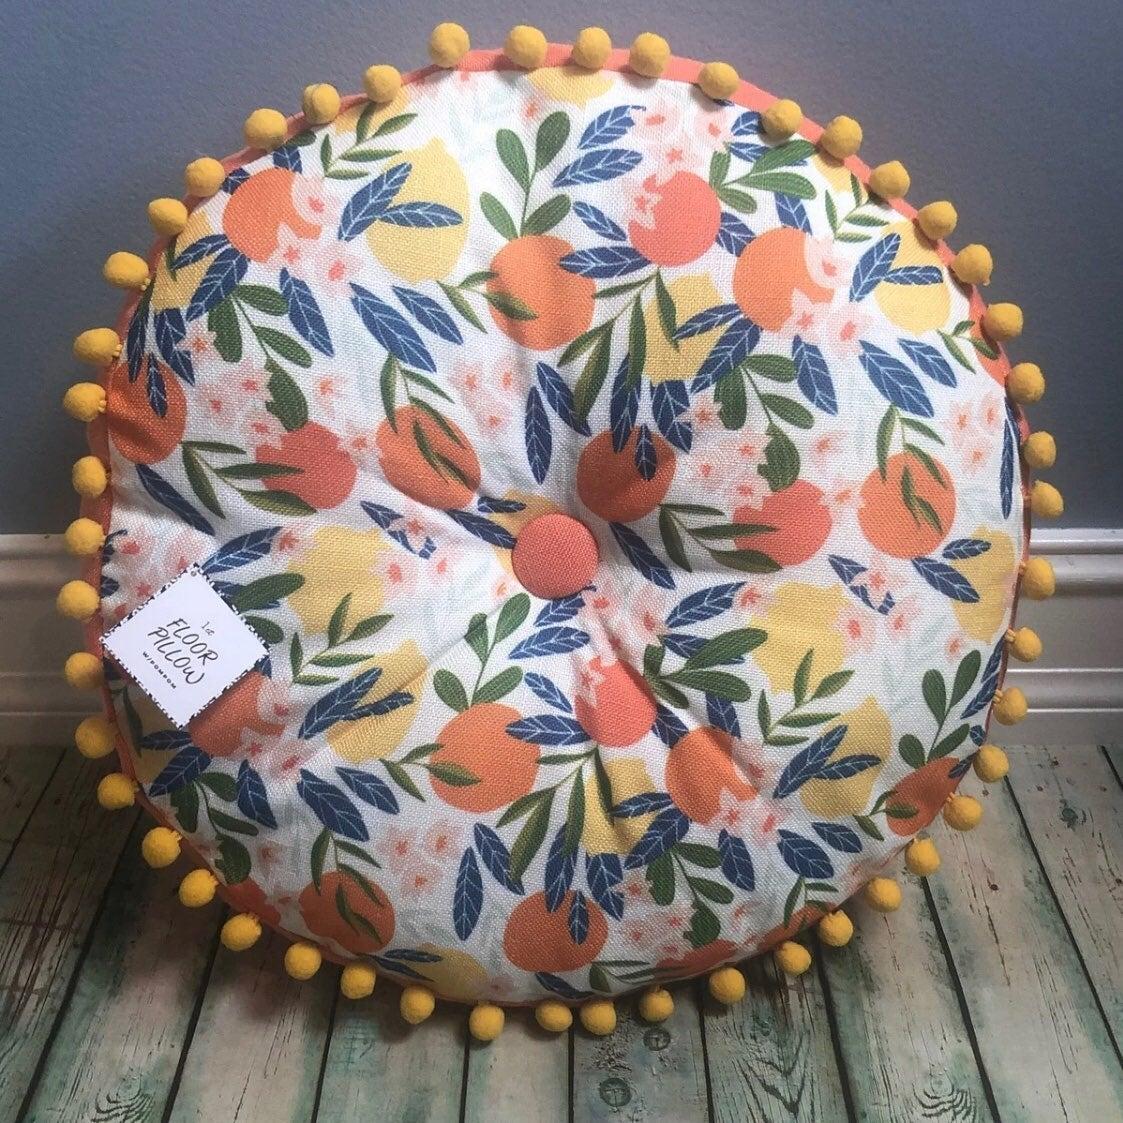 Target BP Citrus Print Pillow